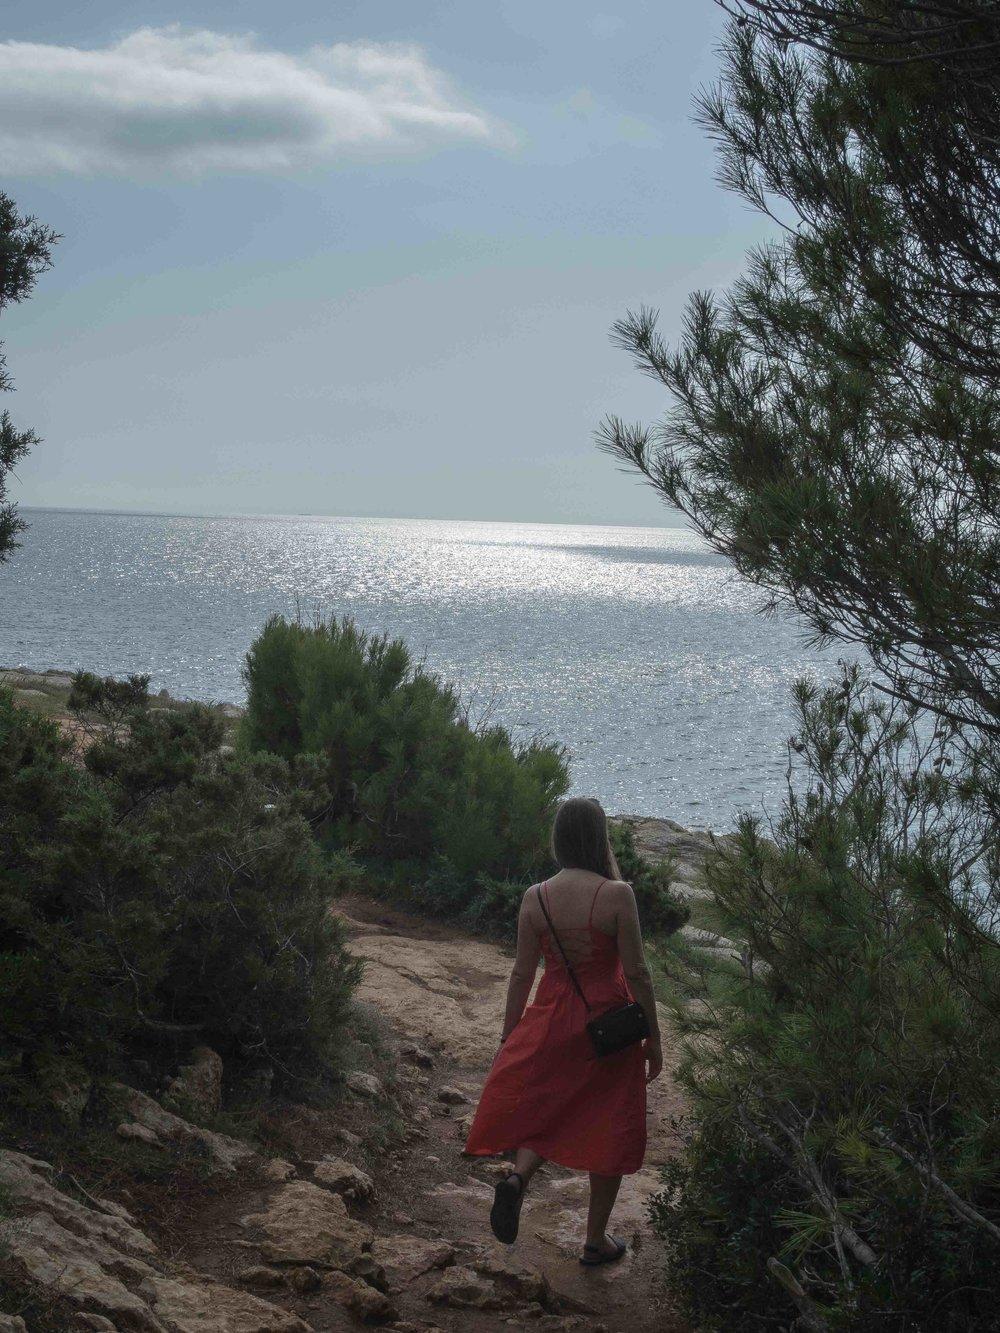 Strolling the Cami De Cavalles